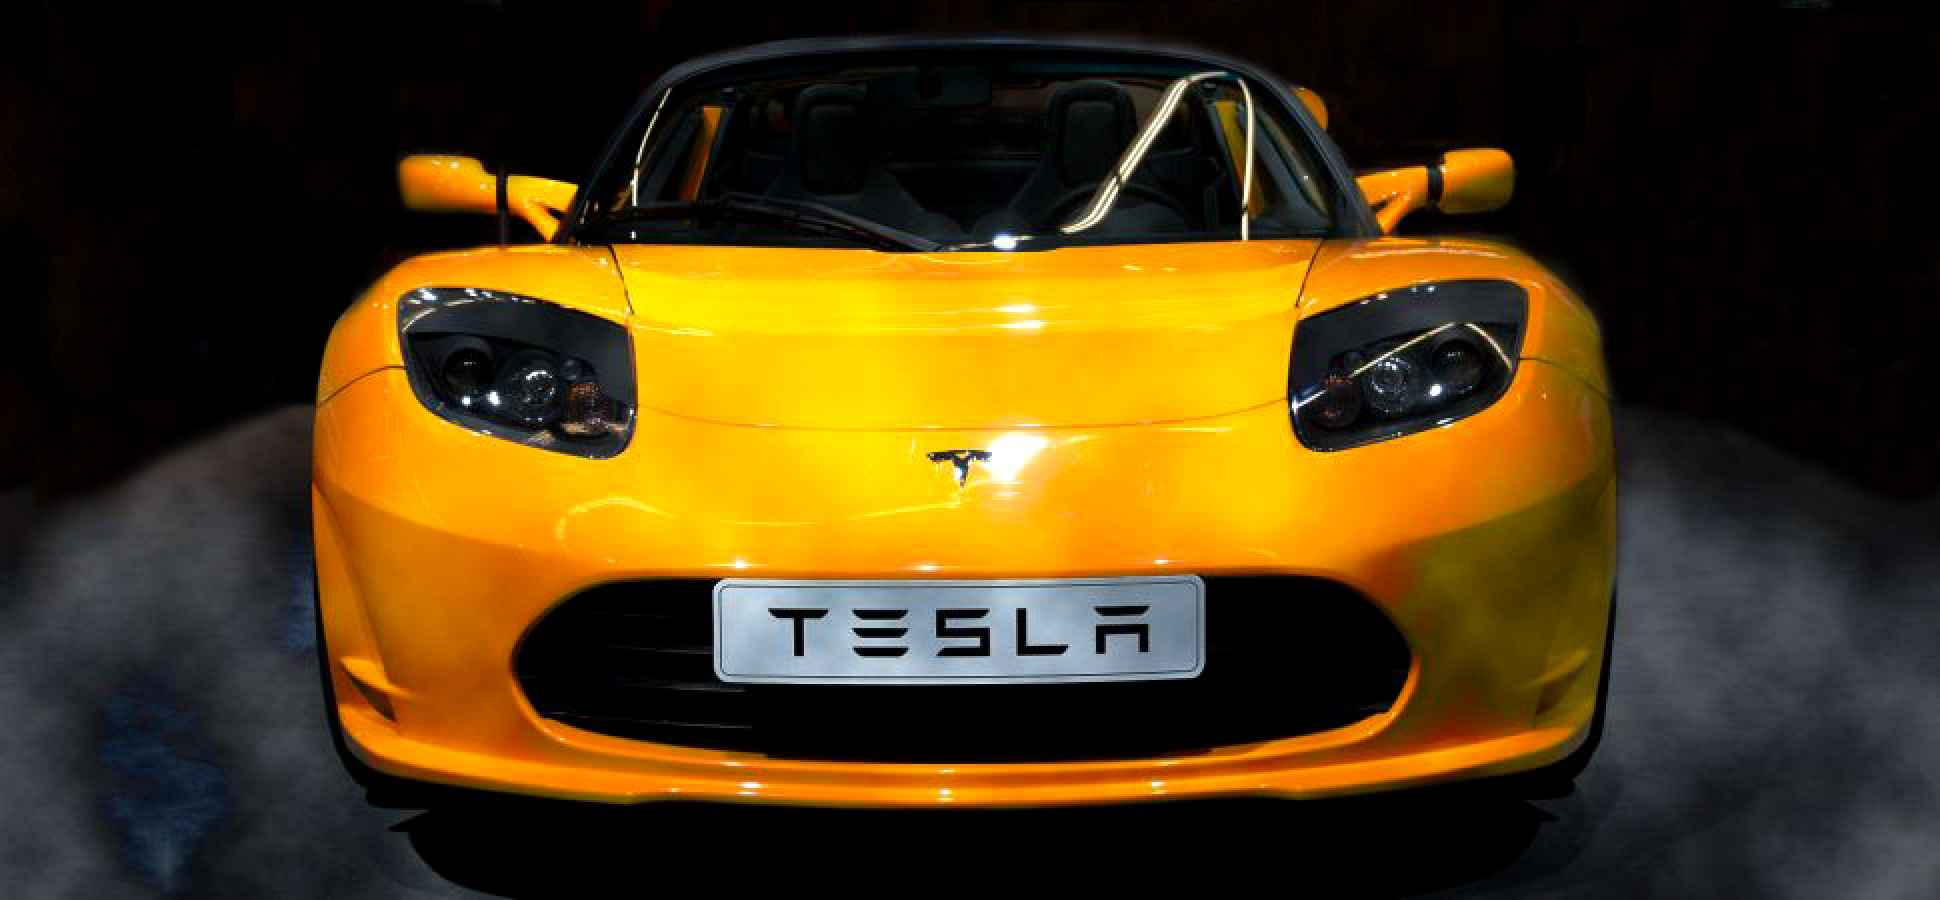 Elon Musk to Drive Cross-Country in a Tesla Model S